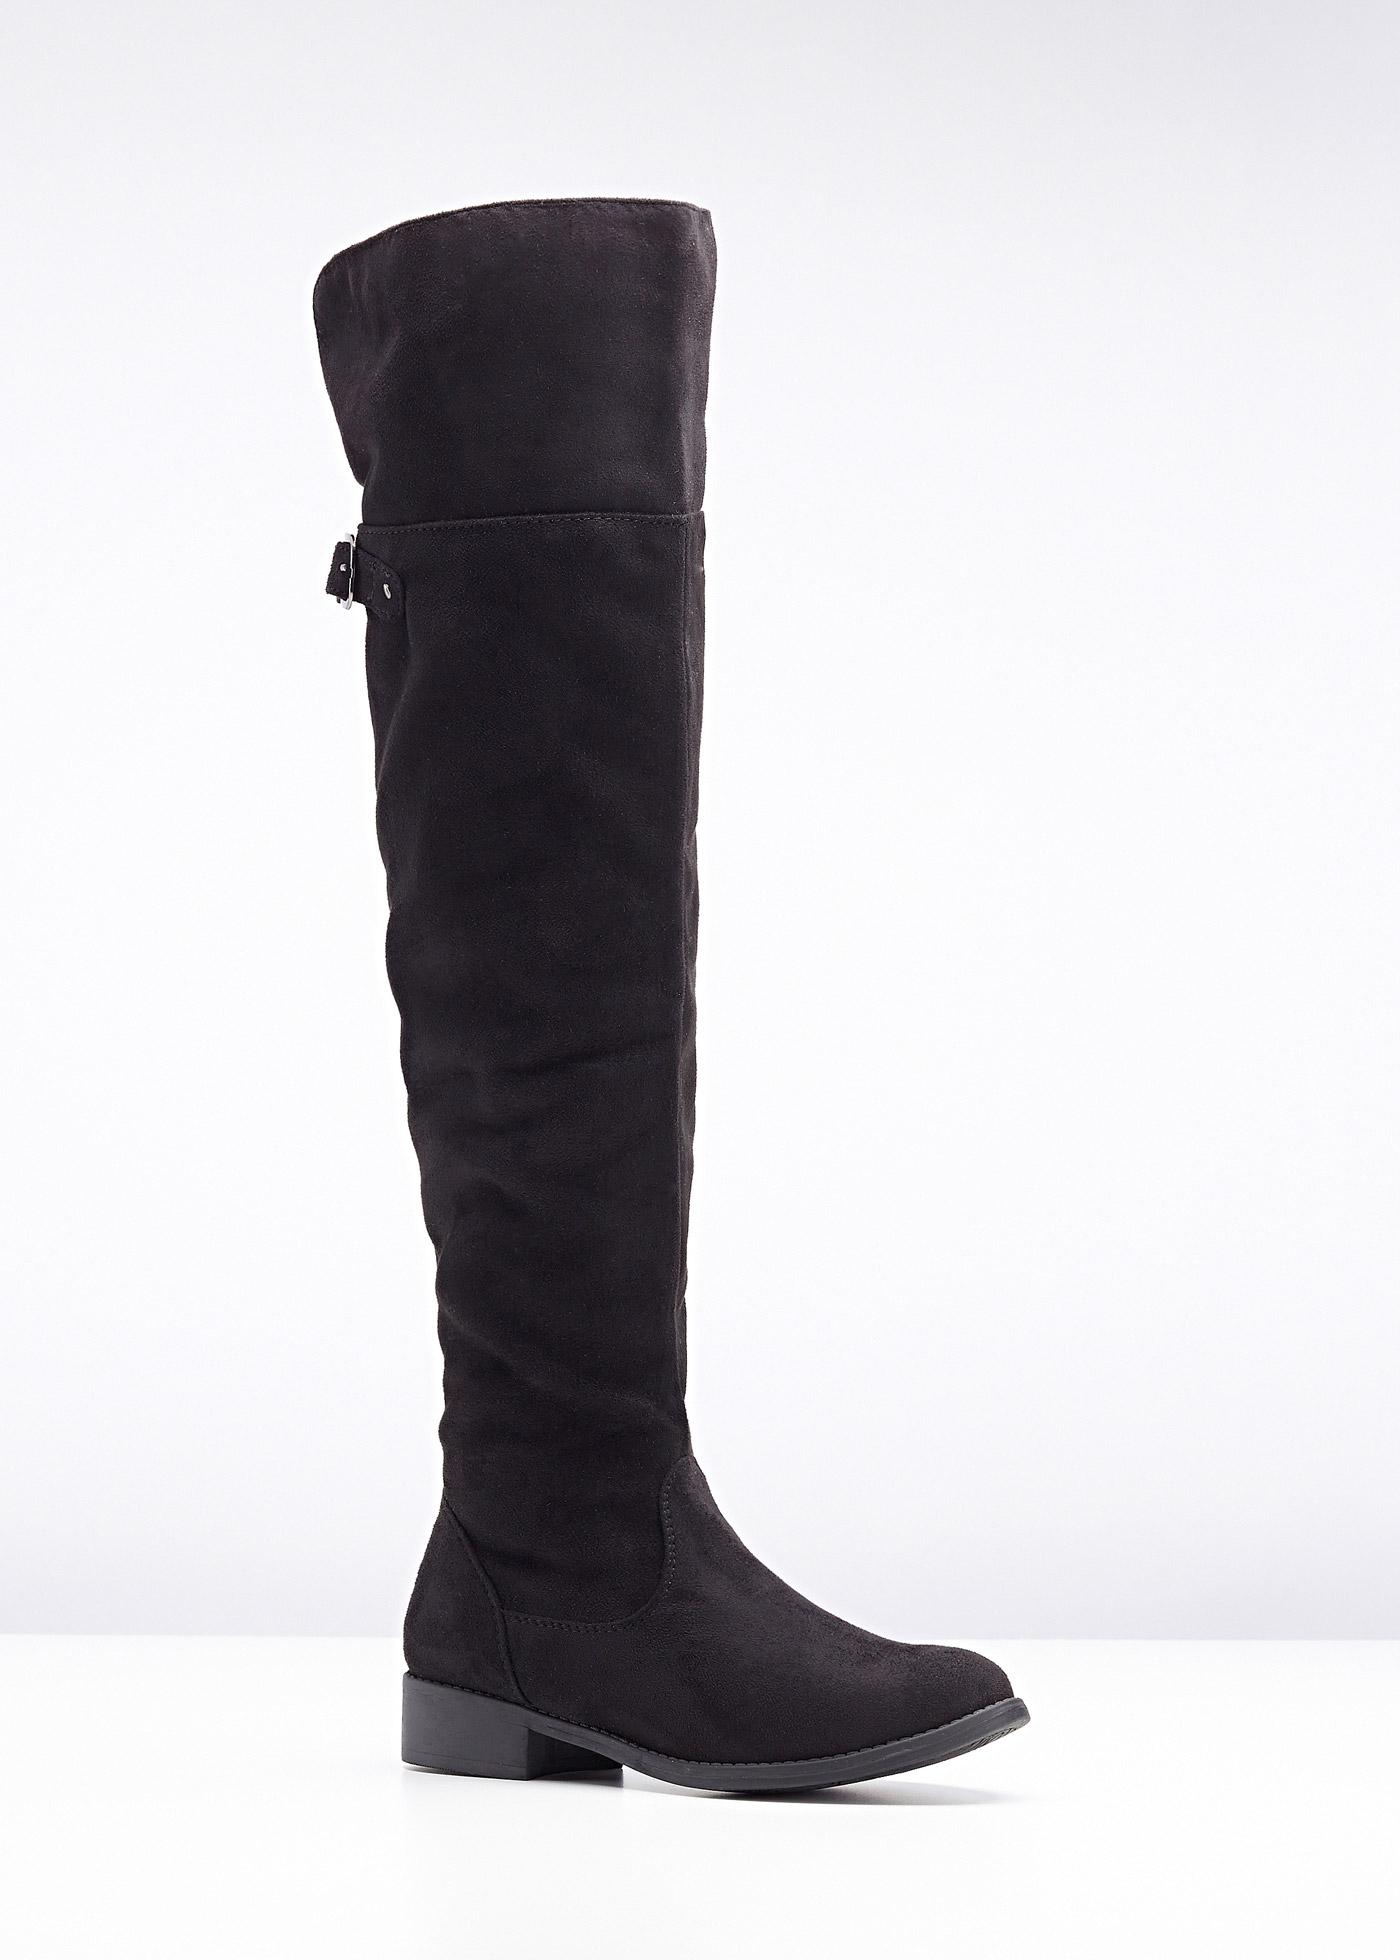 buy online c37b2 00b76 Stylische Overknee Stiefel für breite Waden bei Wundercurves